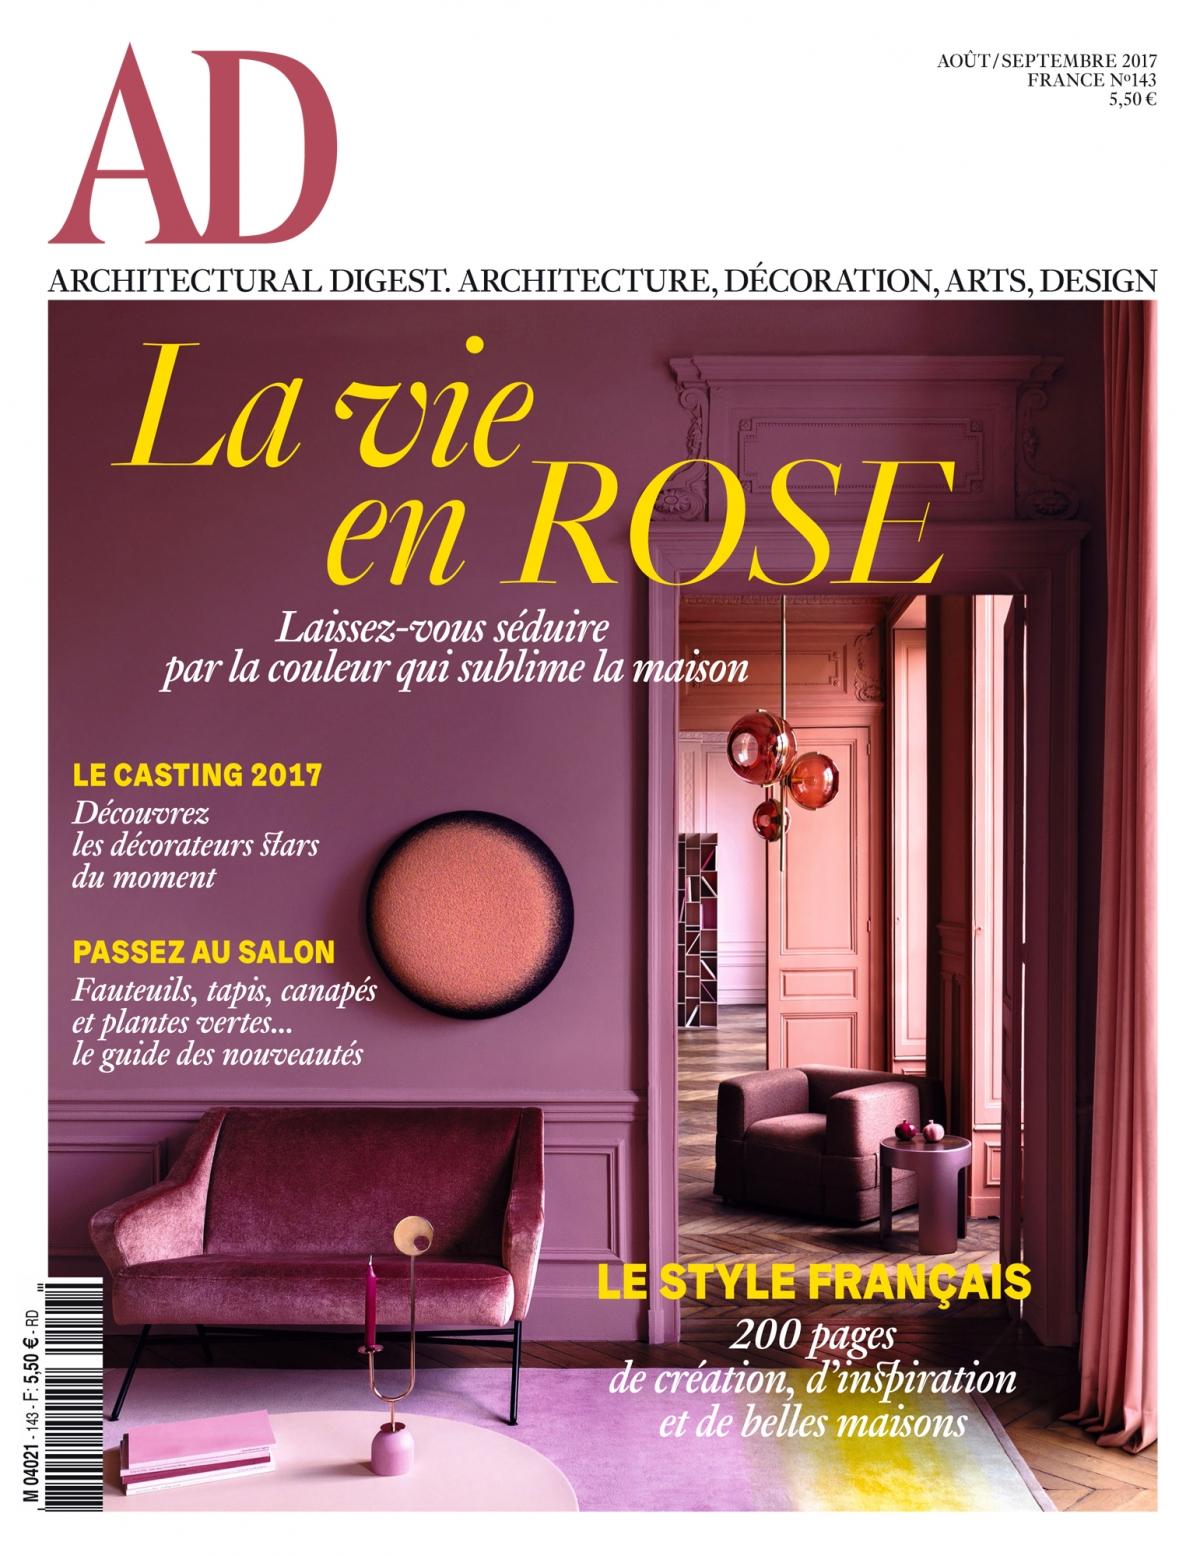 AD France Août / Septembre